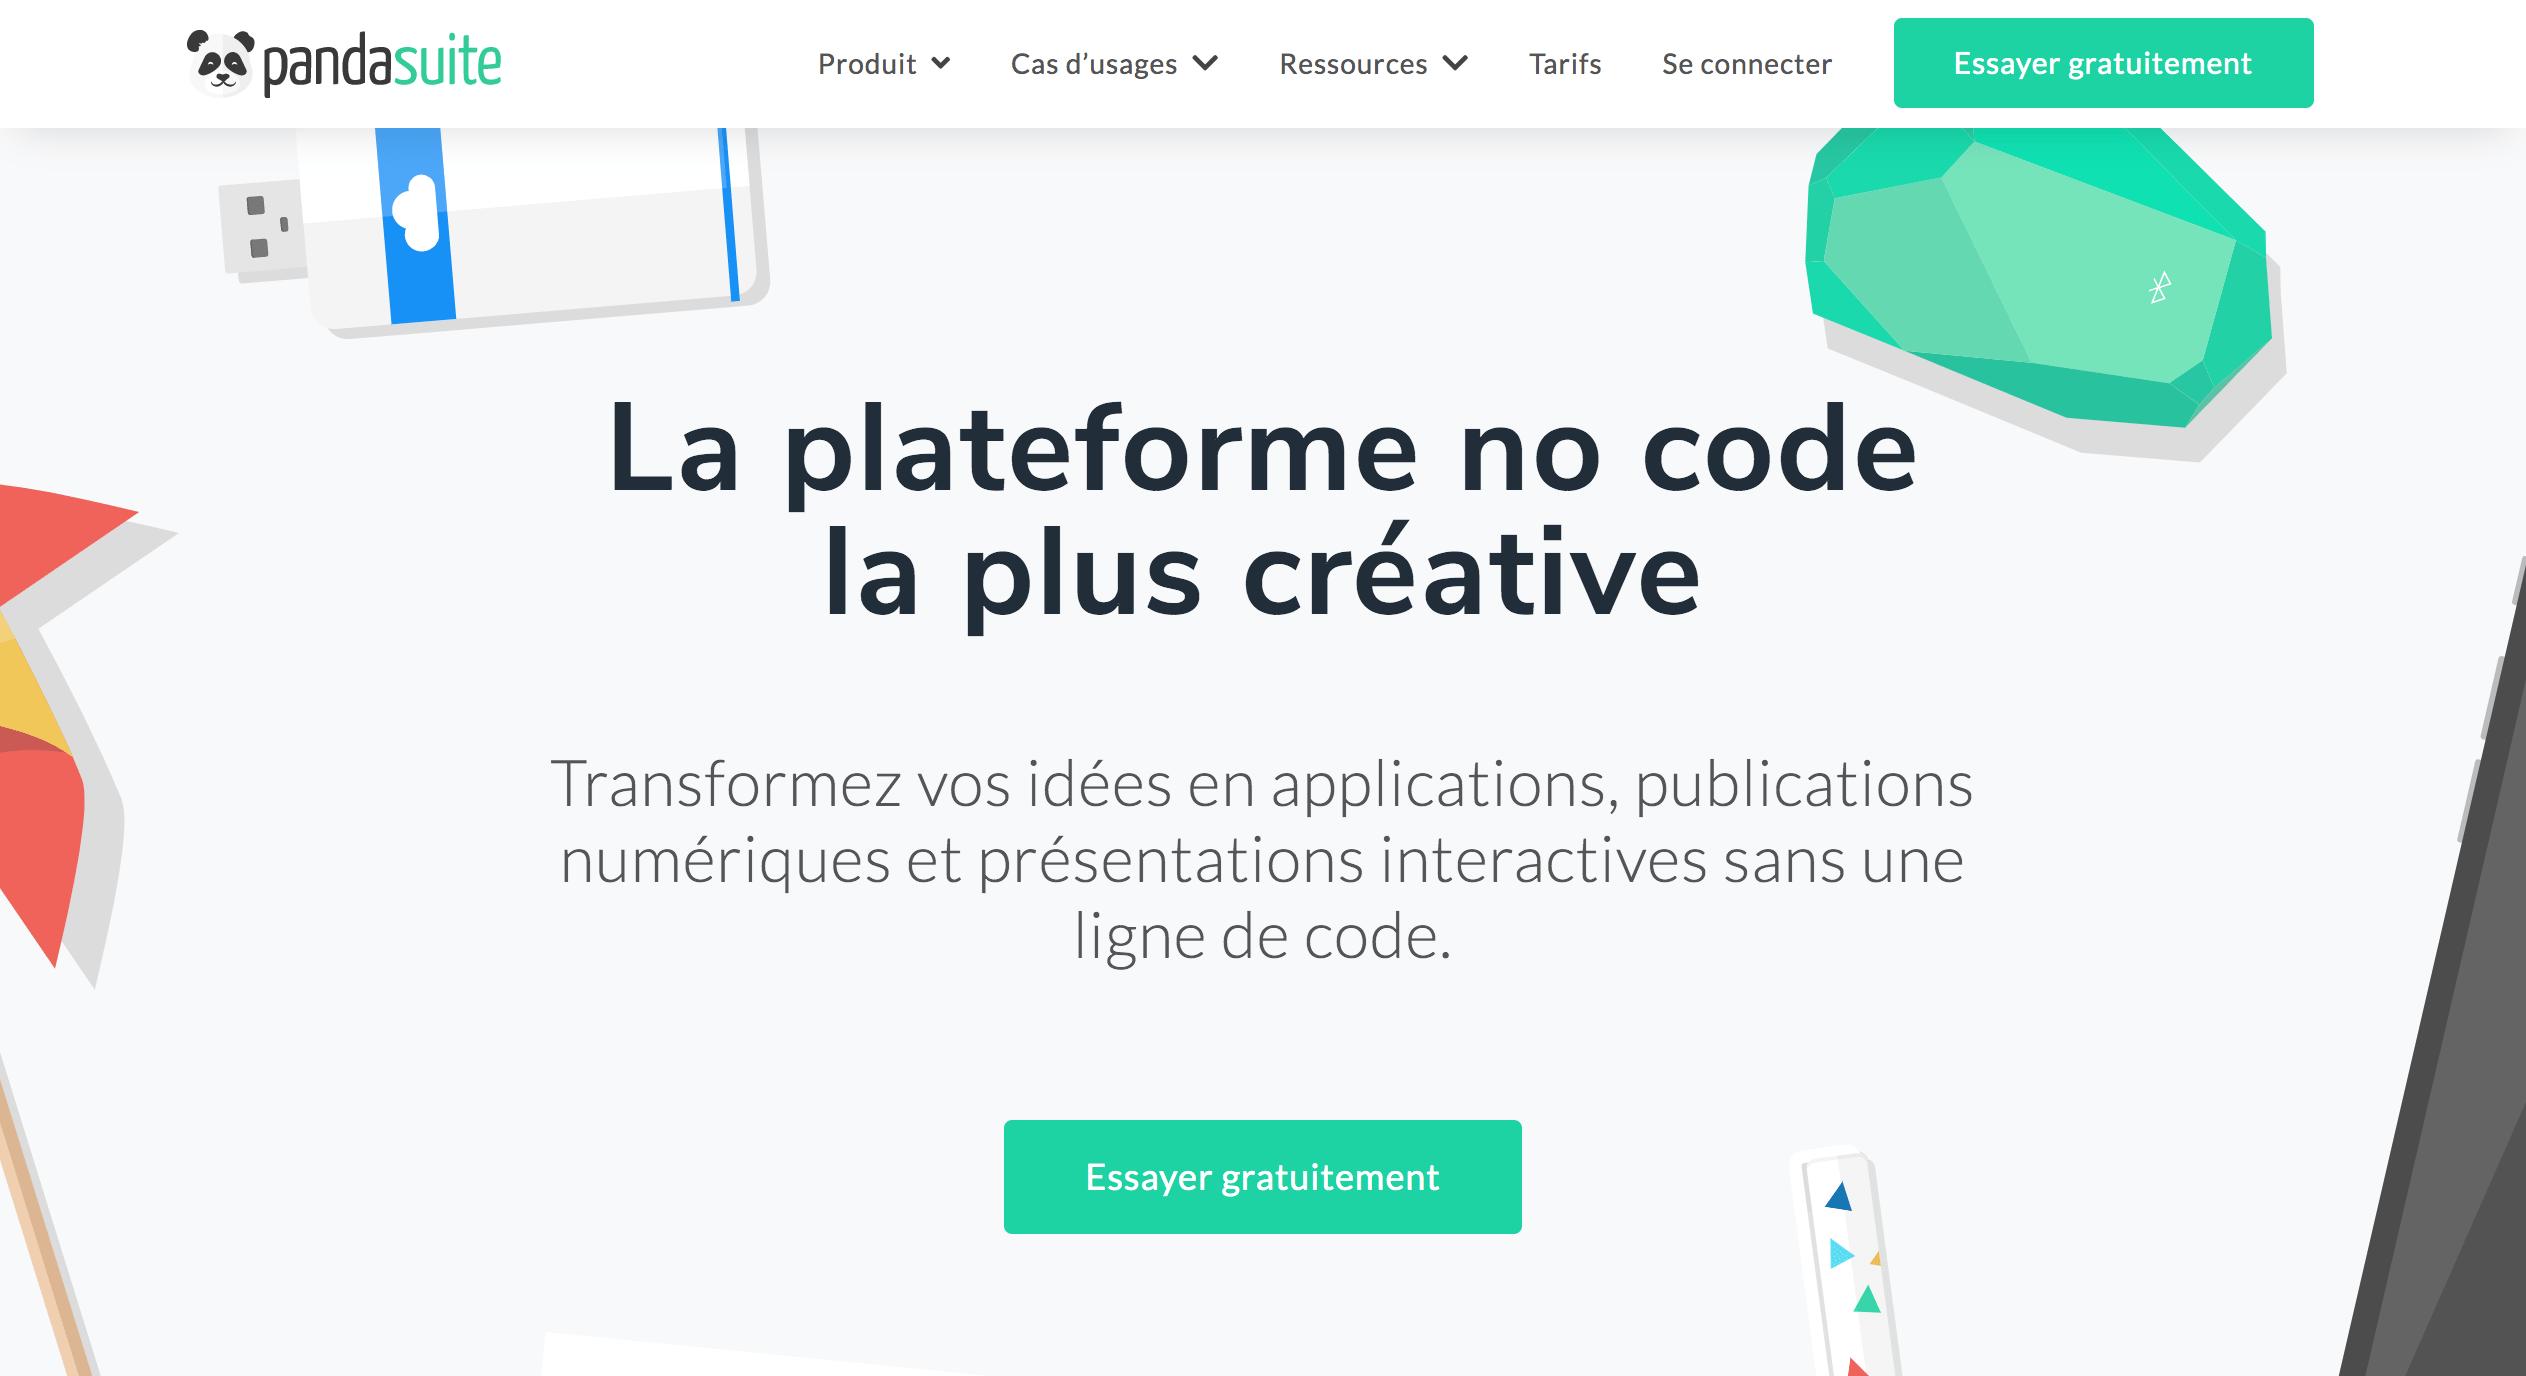 Panda suite no code platform